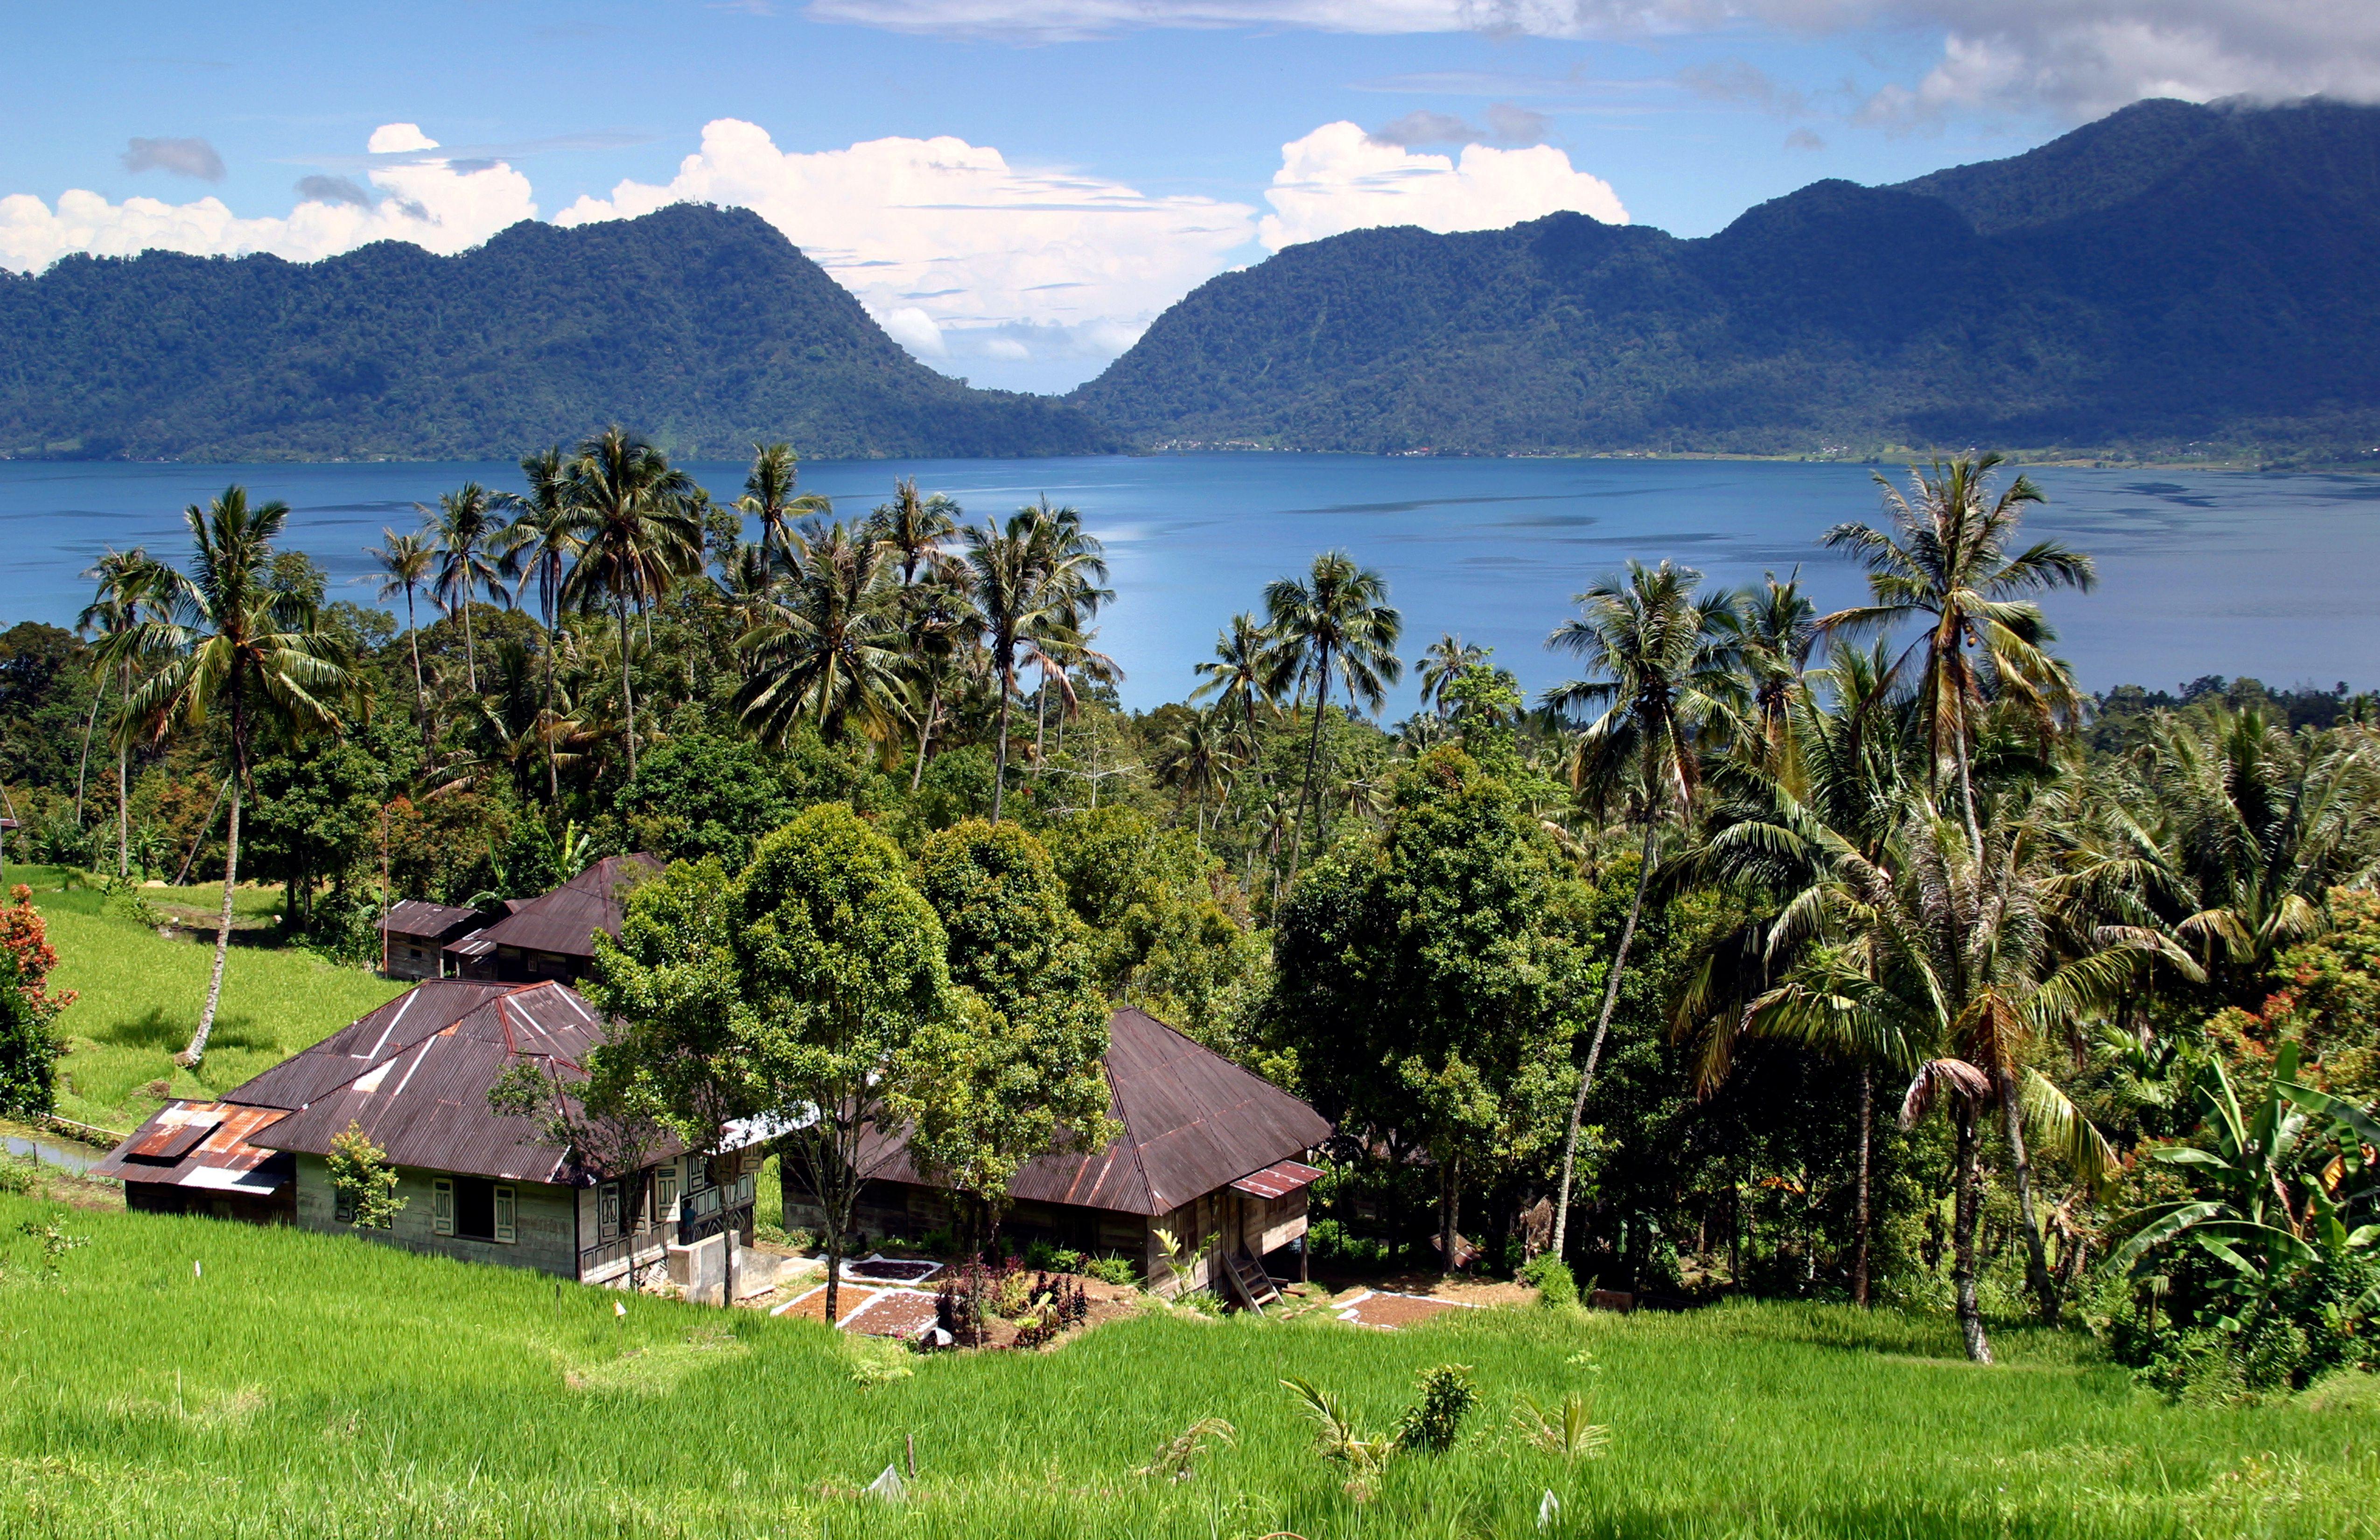 Lake Maninjau in West Sumatra